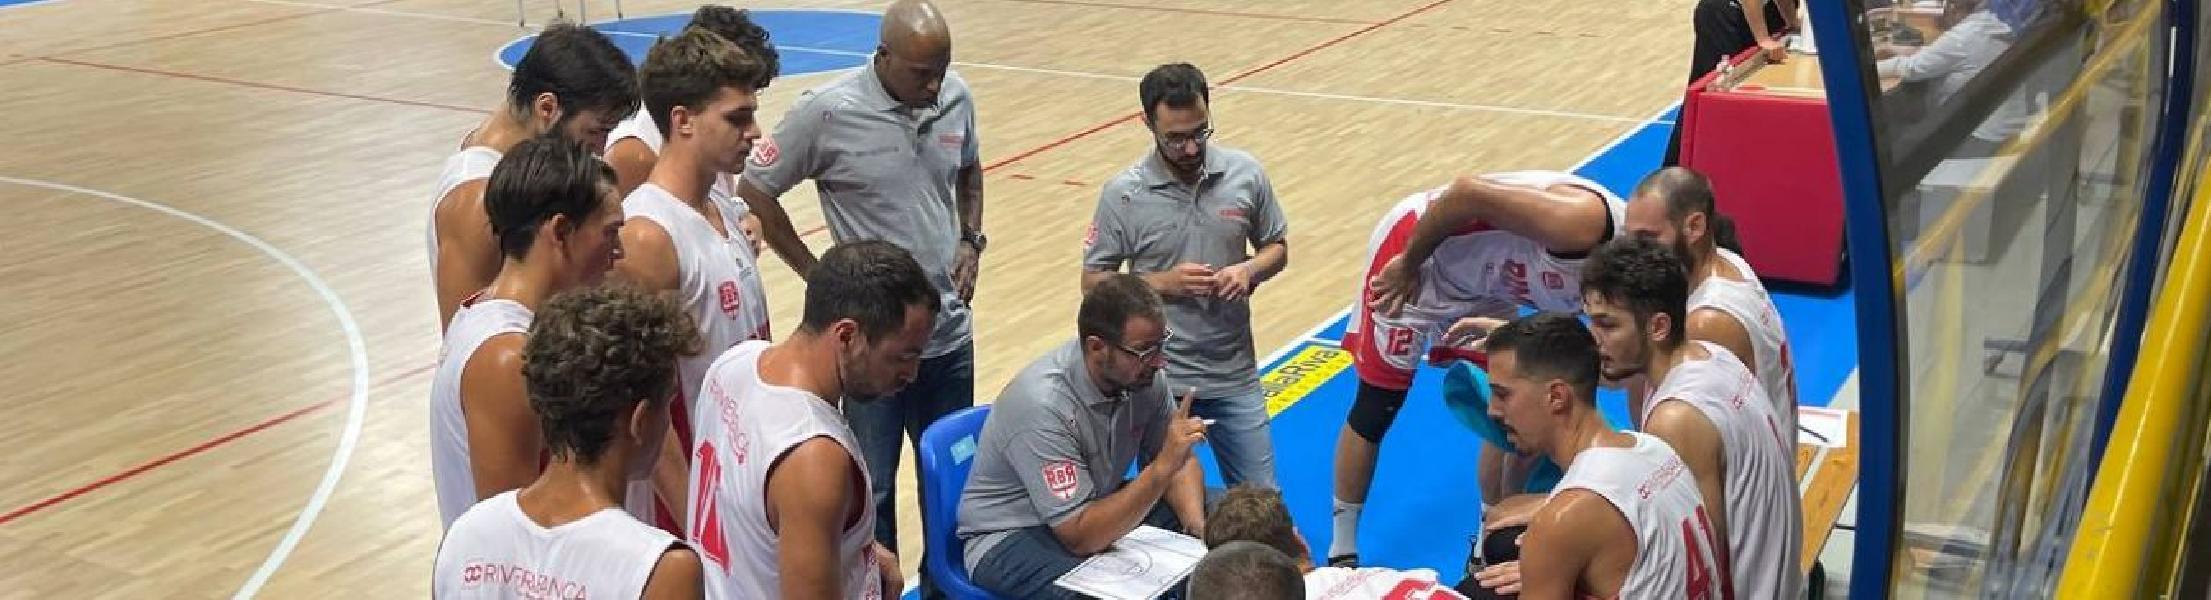 https://www.basketmarche.it/immagini_articoli/11-09-2021/supercoppa-rinascita-basket-rimini-ospita-sutor-montegranaro-parole-coach-ferrari-600.jpg